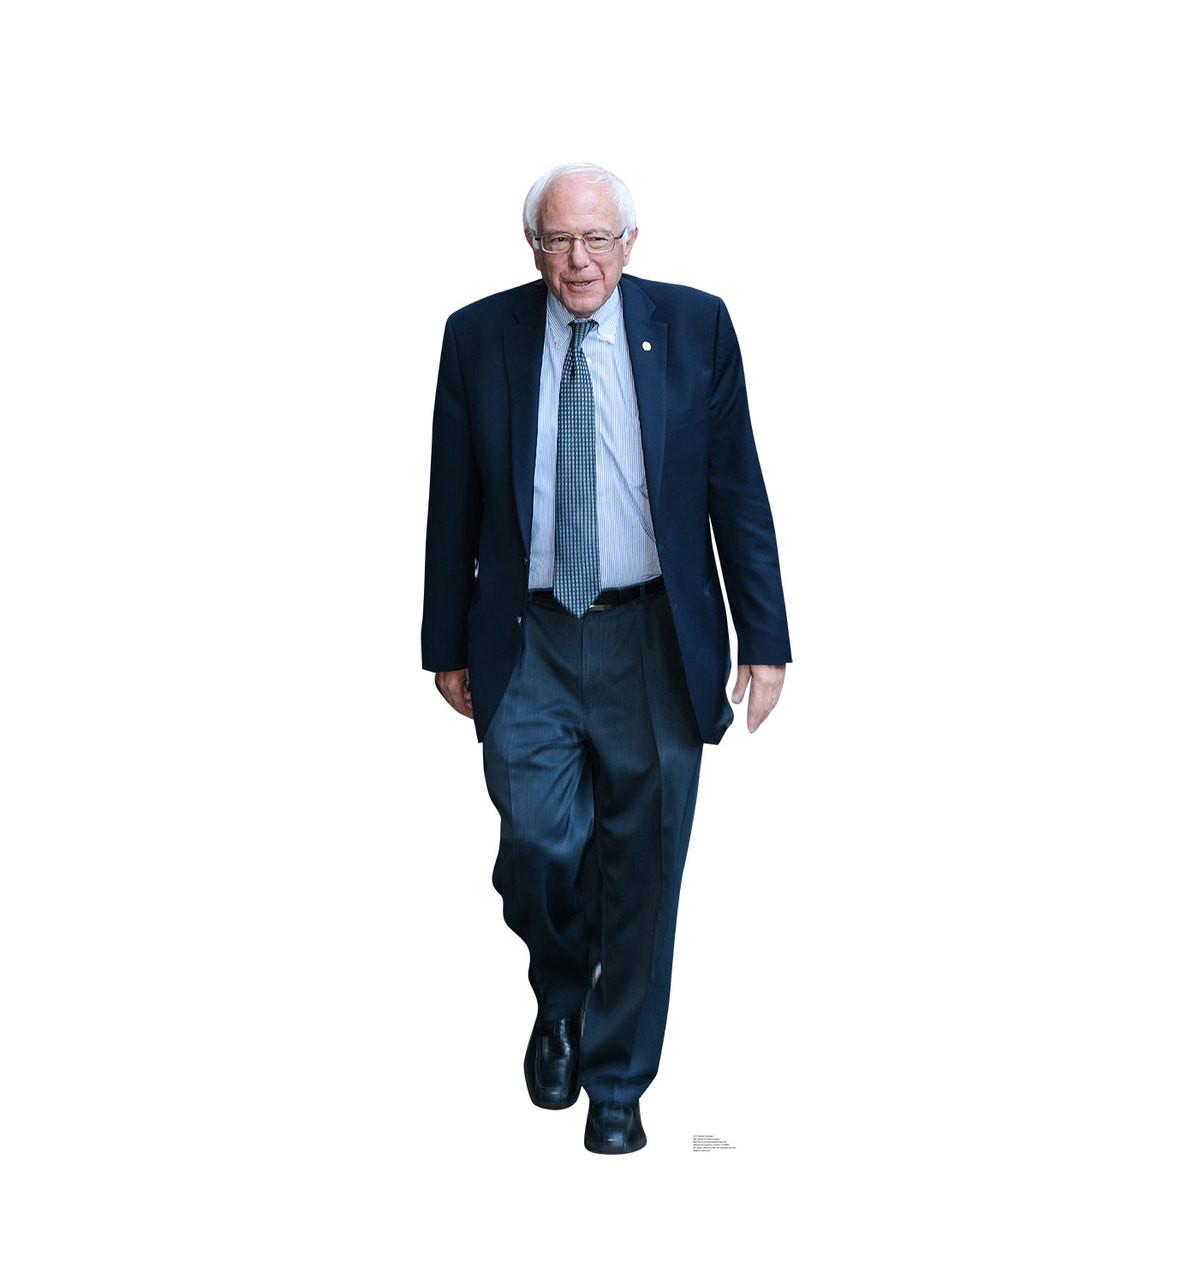 Life-size Bernie Sanders Cardboard Standup 2